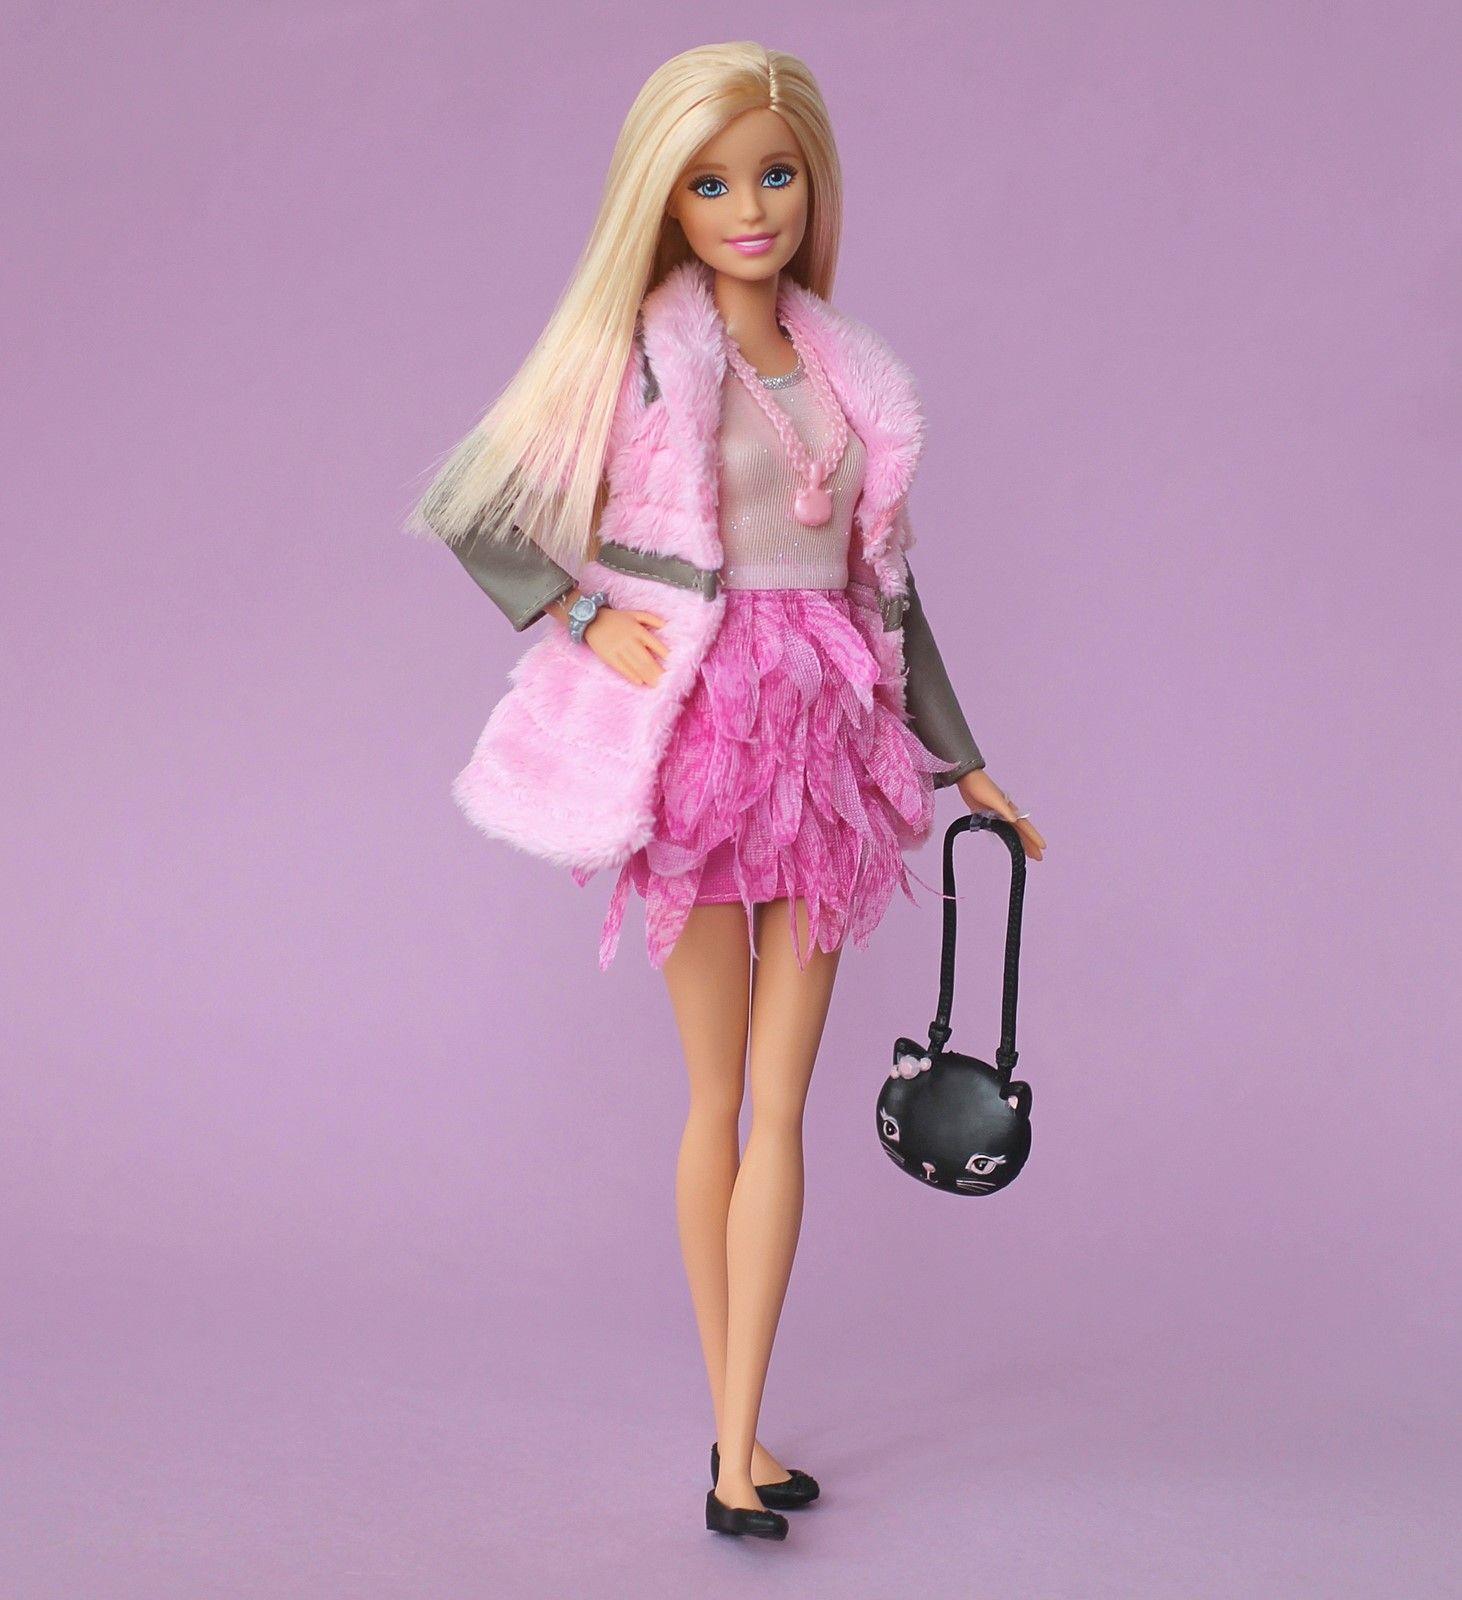 barbie fashionistas/fashiondollcollector / 39.28.6